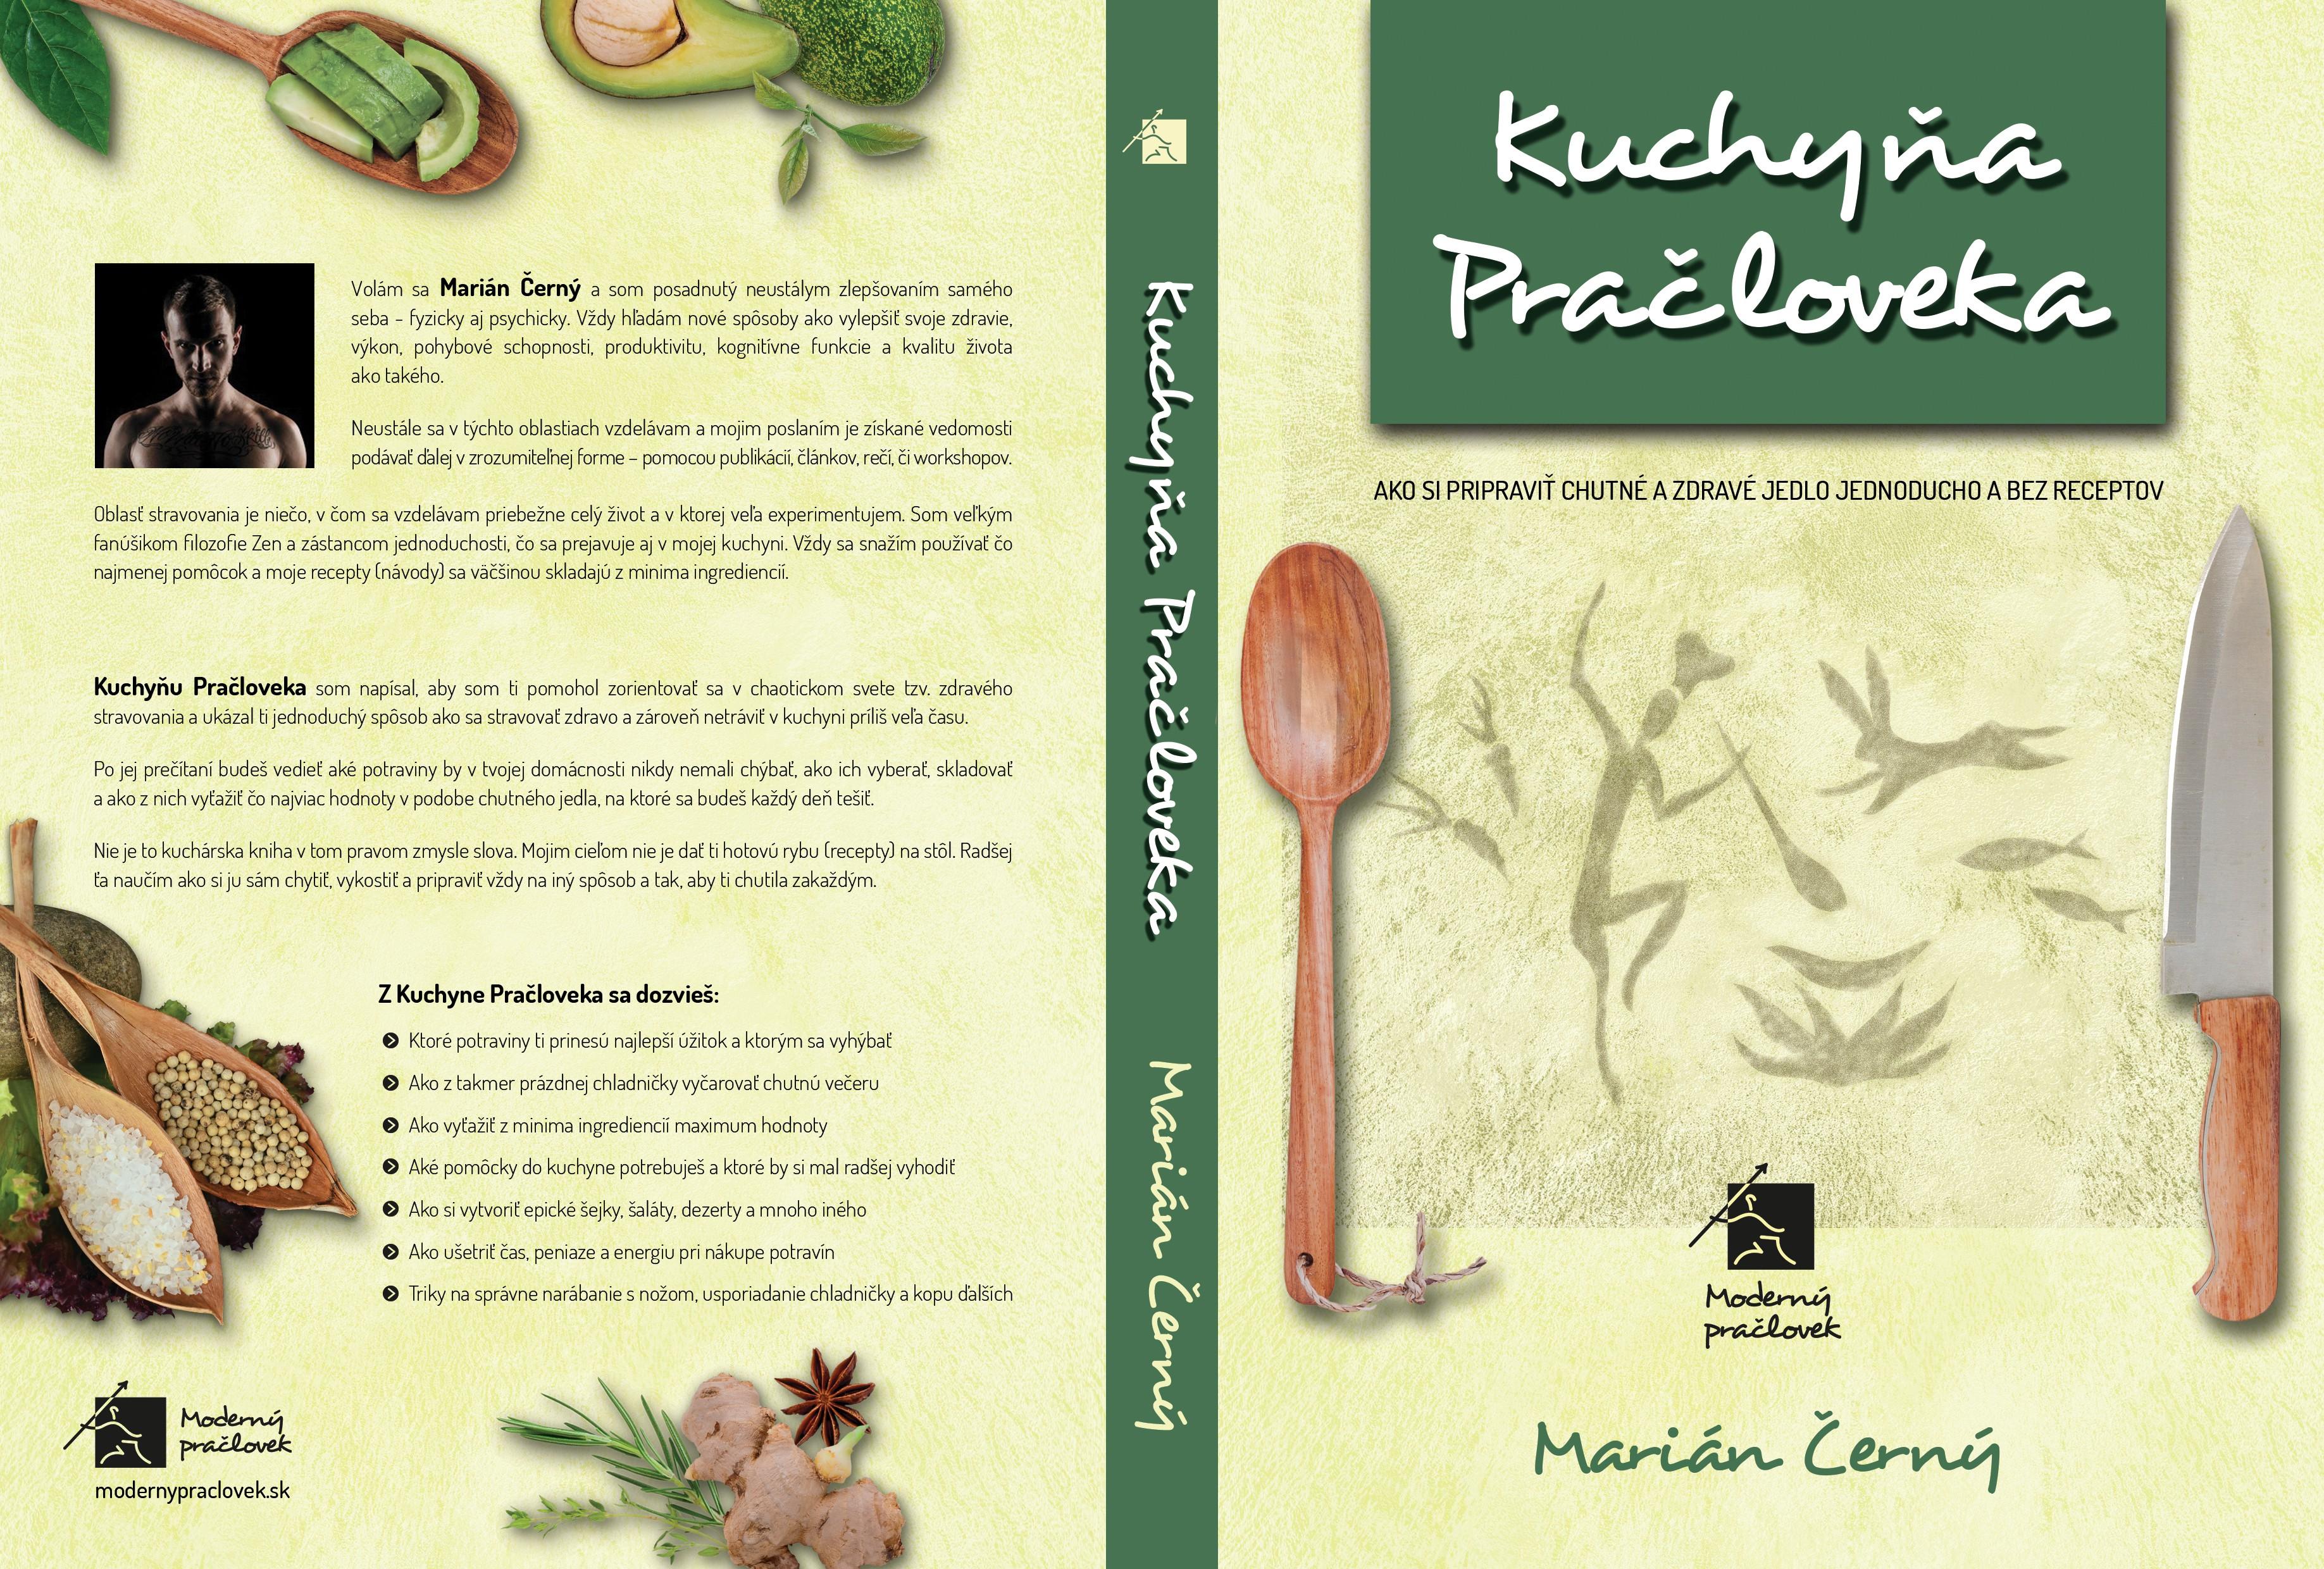 Create a book cover for the Caveman's non-cookbook